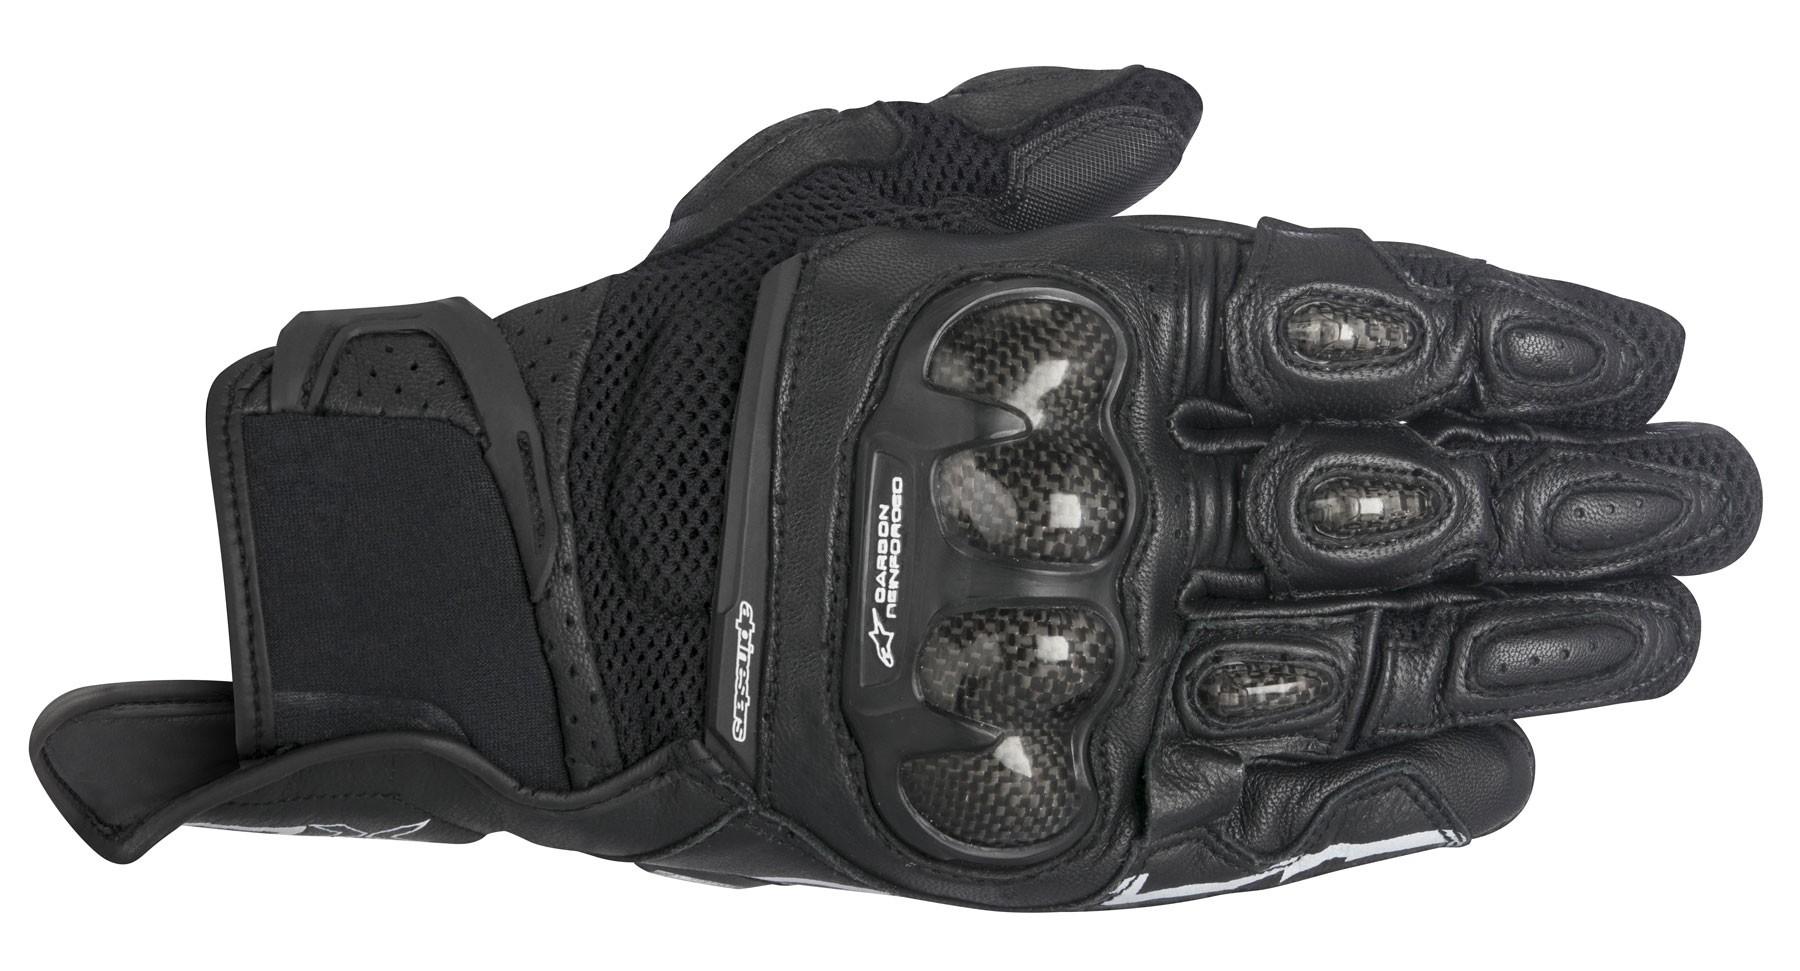 Black riding gloves - Alpinestars 2016 Stella Spx Air Carbon Leather Mesh Motorcycle Riding Gloves Black